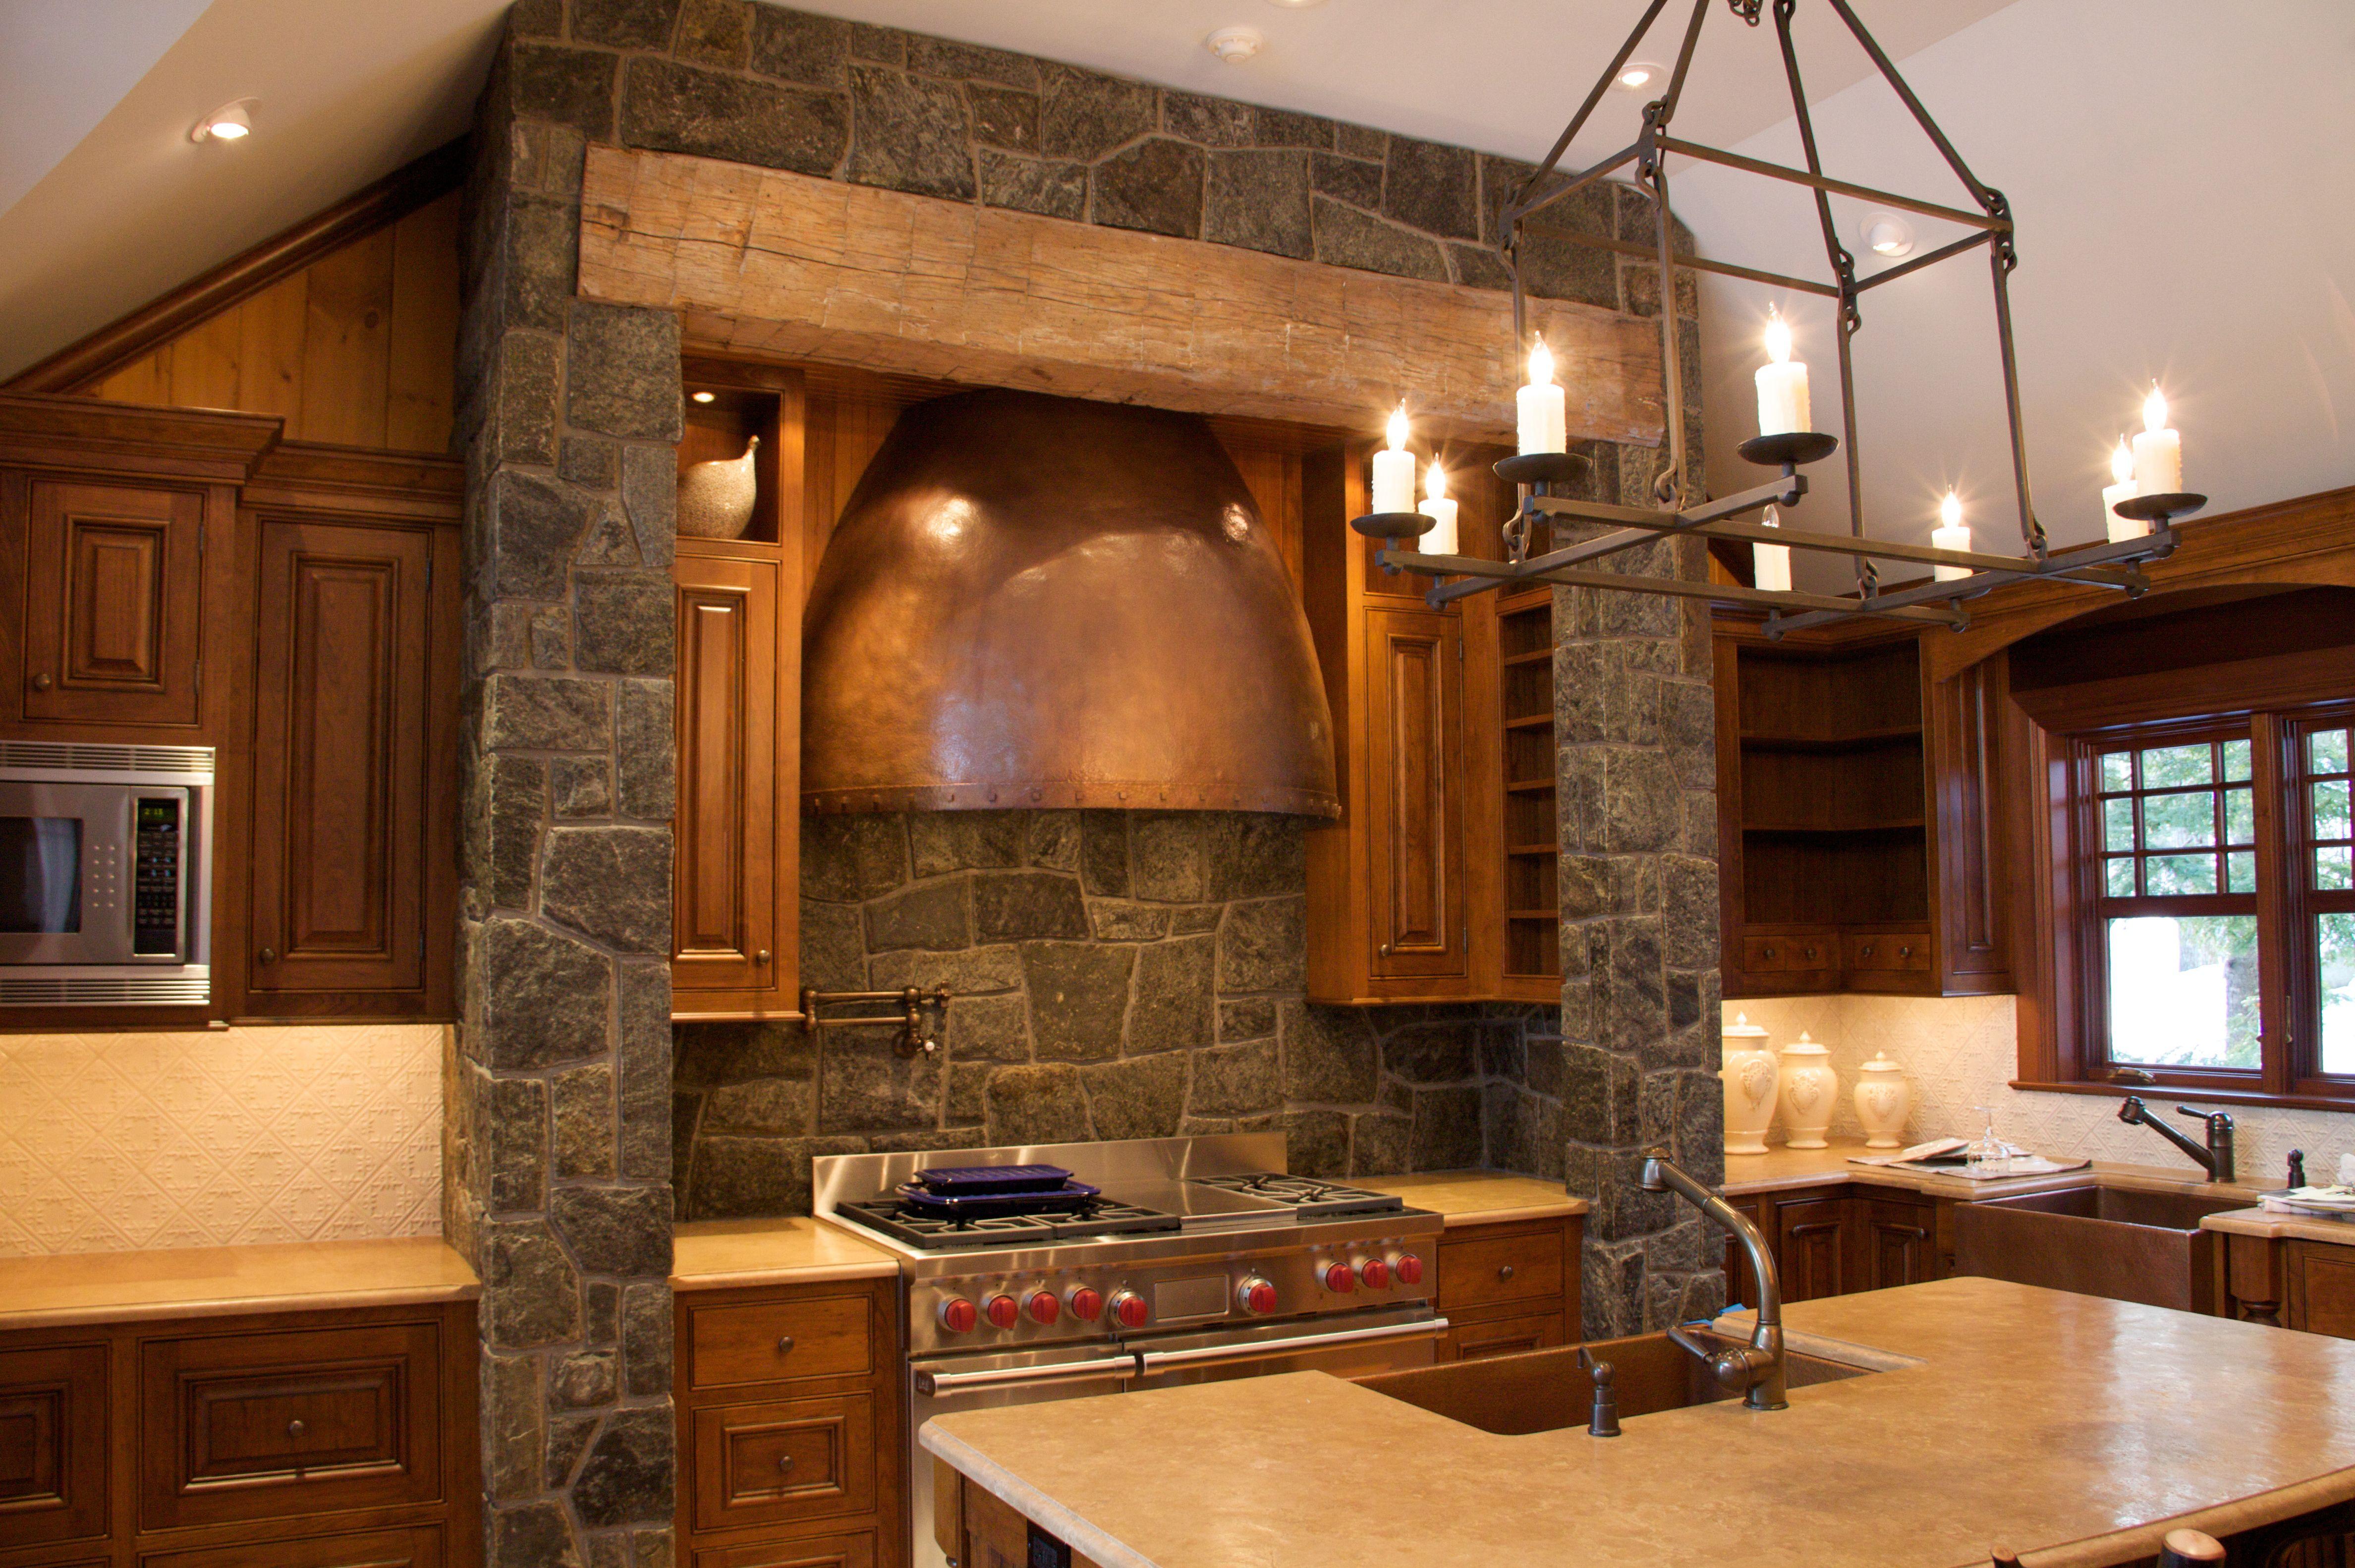 Kitchen Accessories, Copper Kitchen Accessories With Copper ...